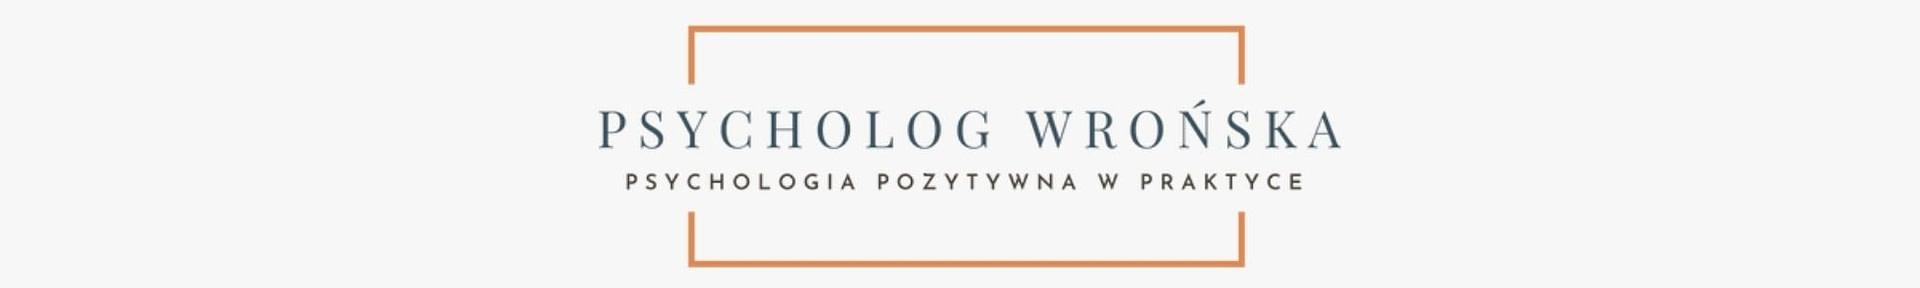 Psycholog Wrońska